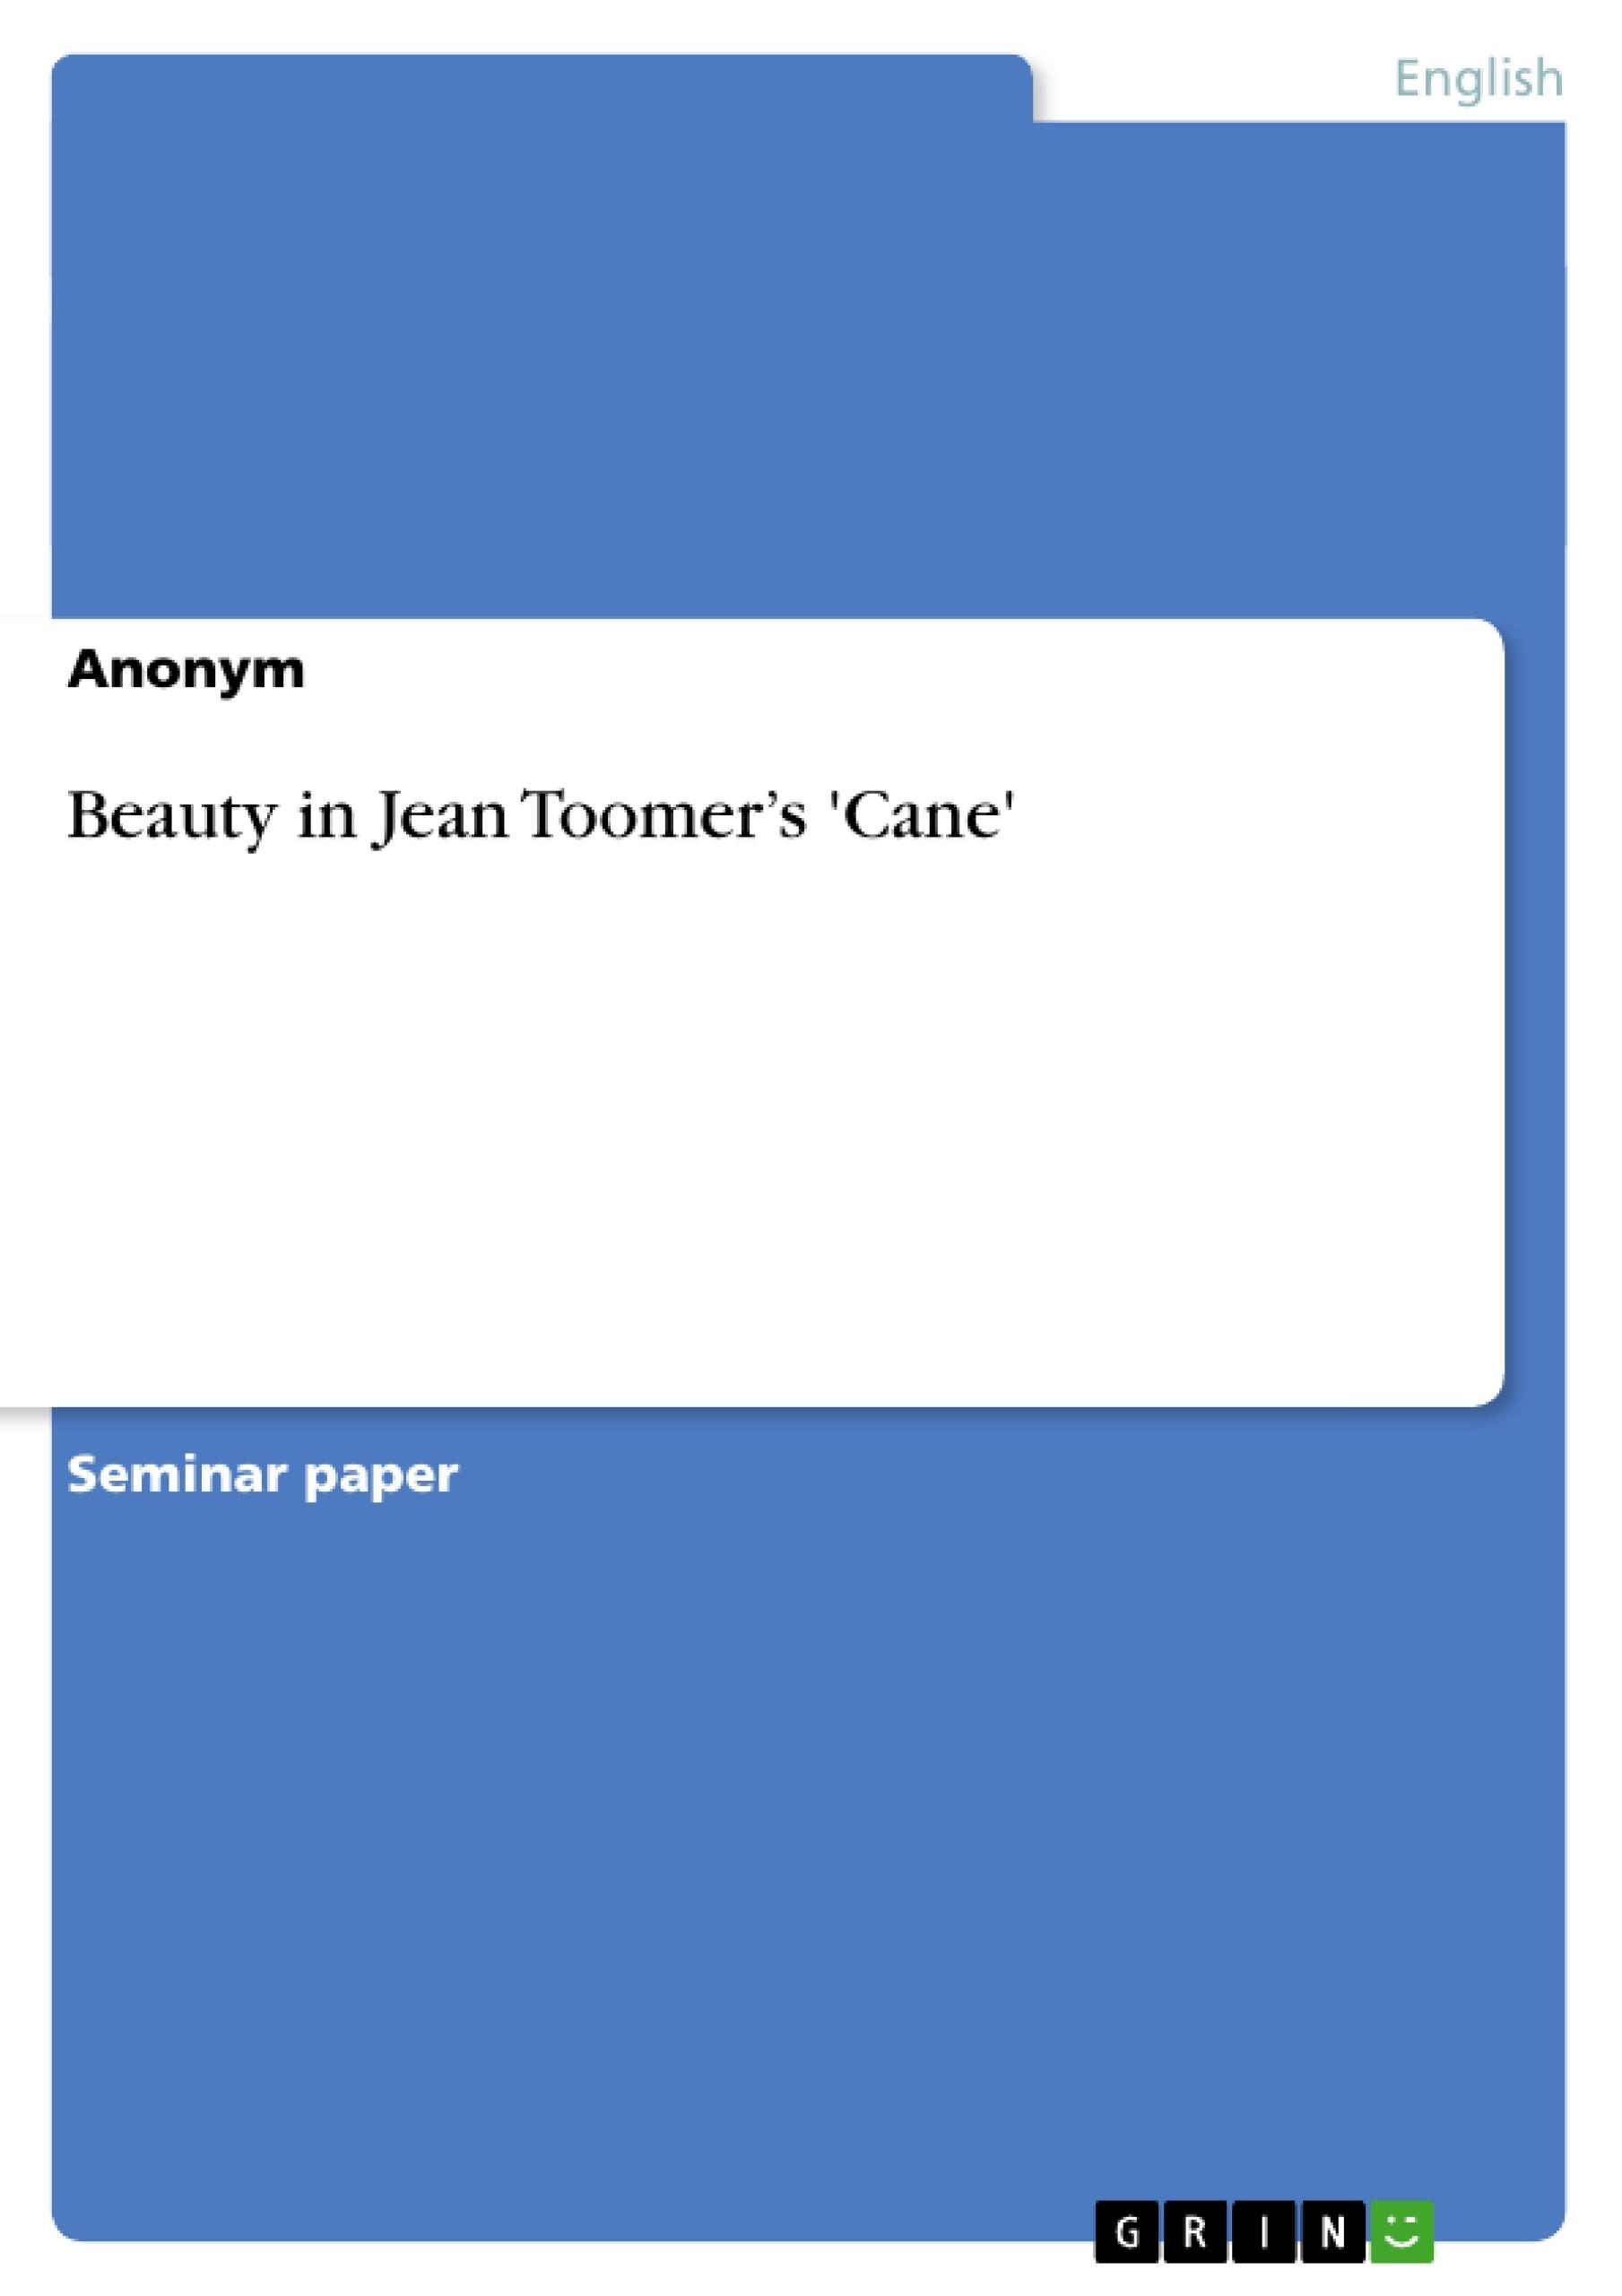 jean toomer biography